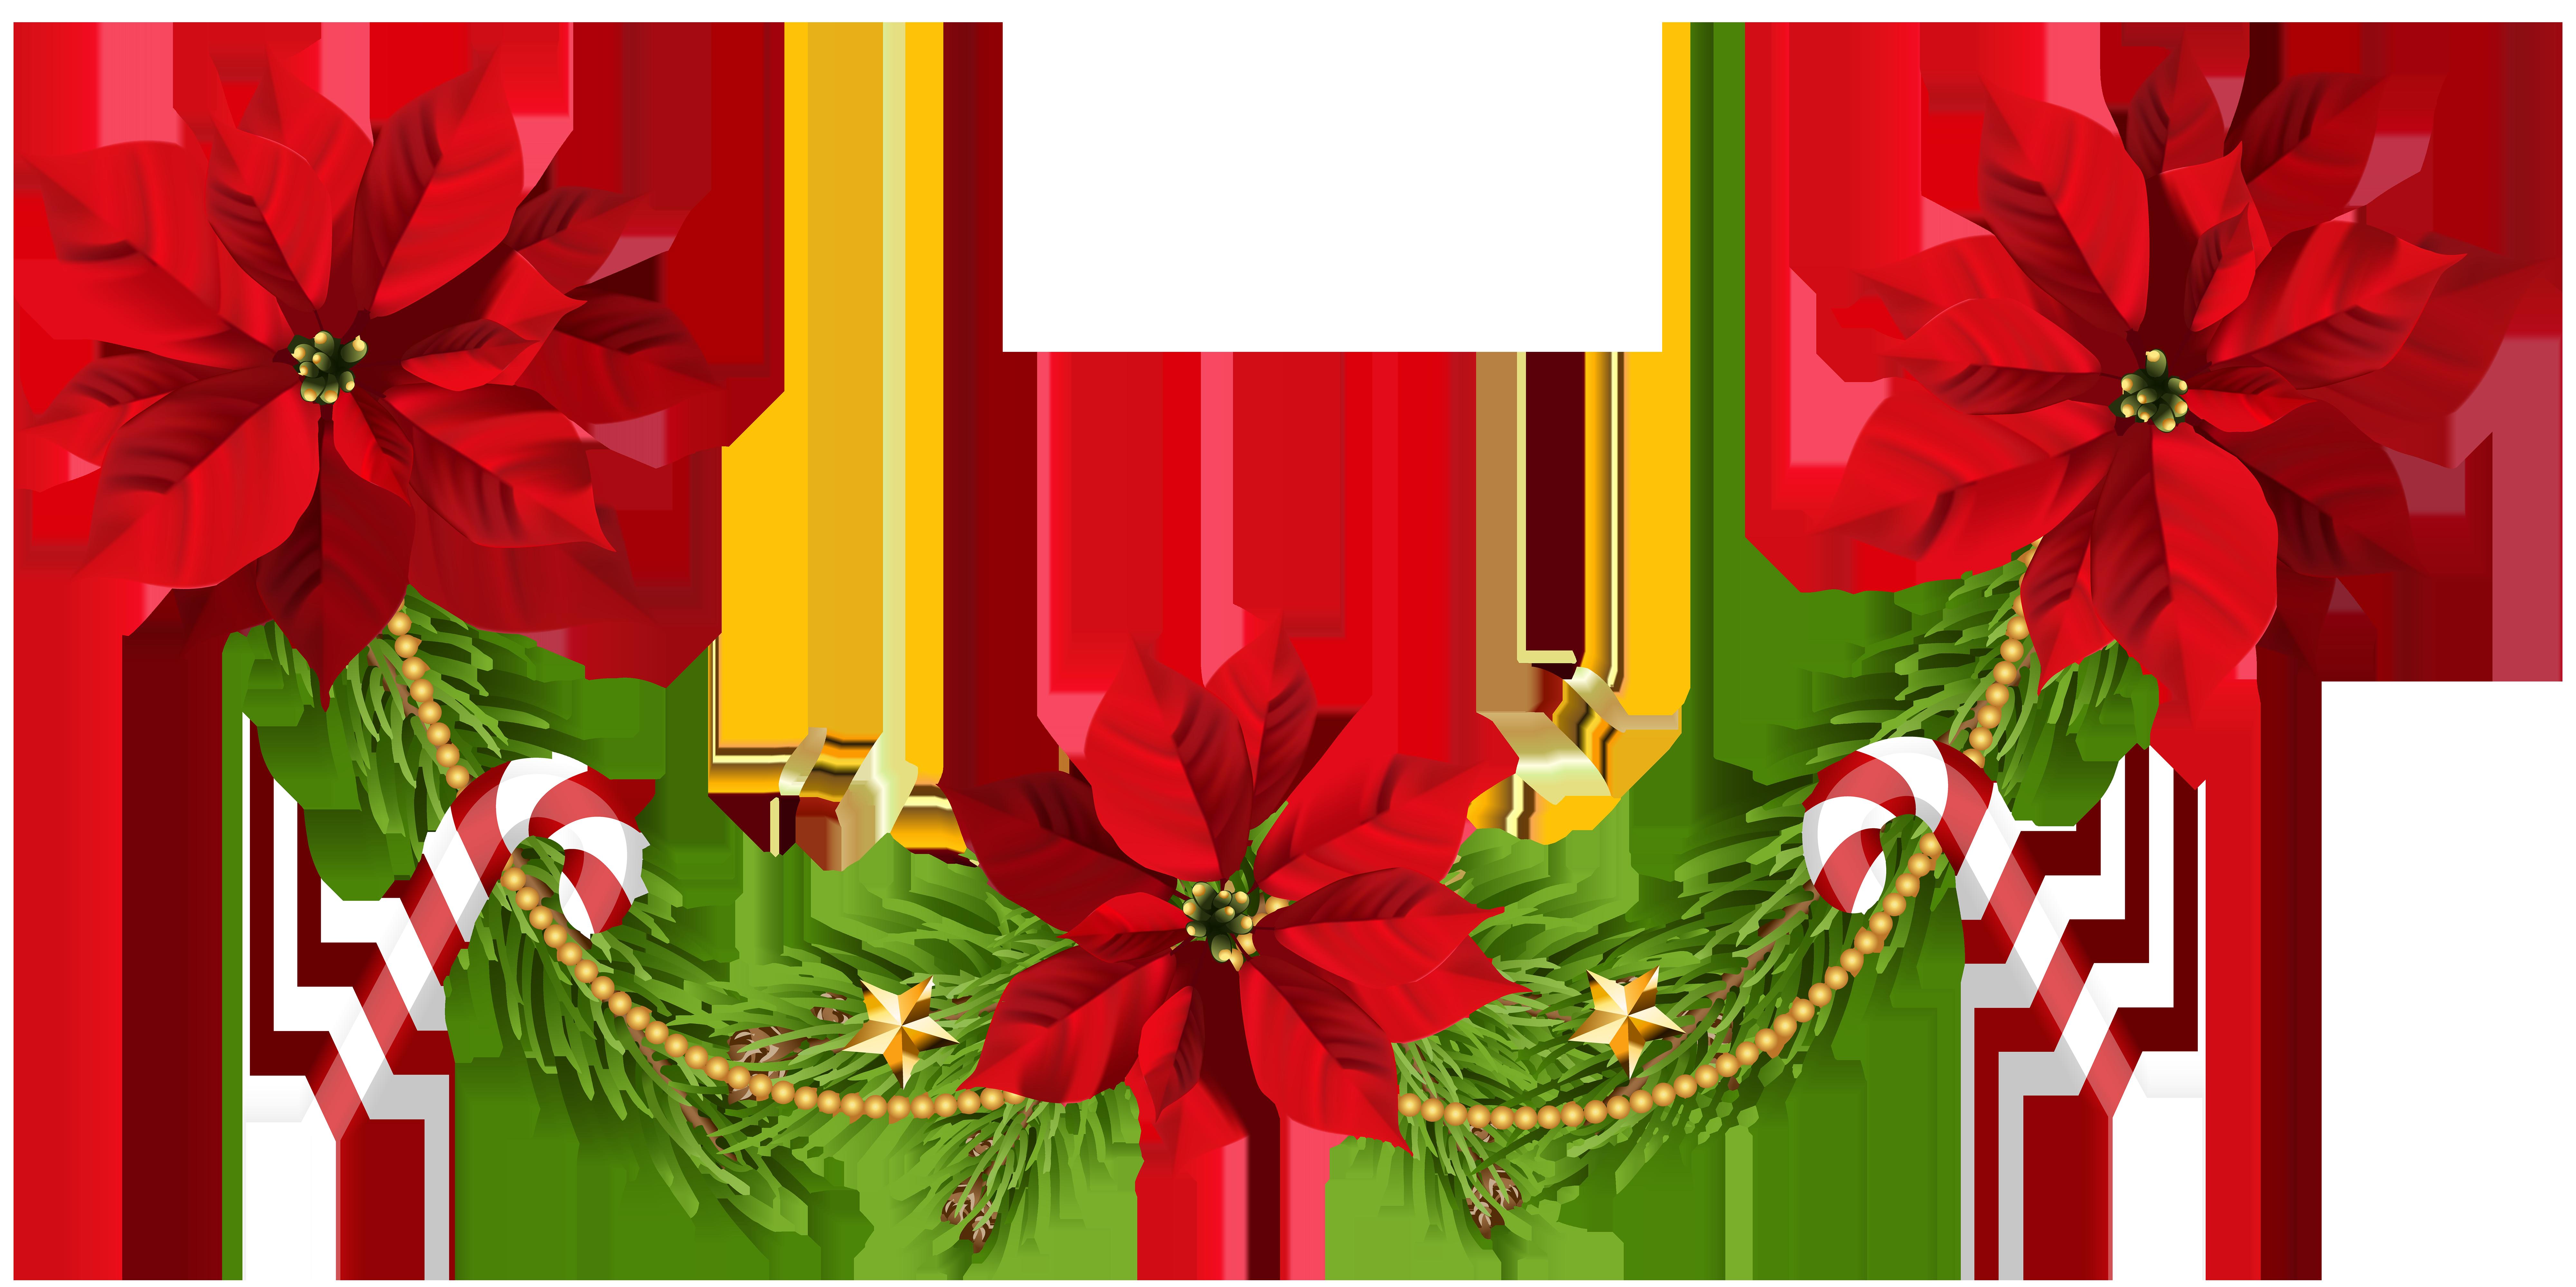 Christmas Poinsettias Garland Clip Art PNG Image.